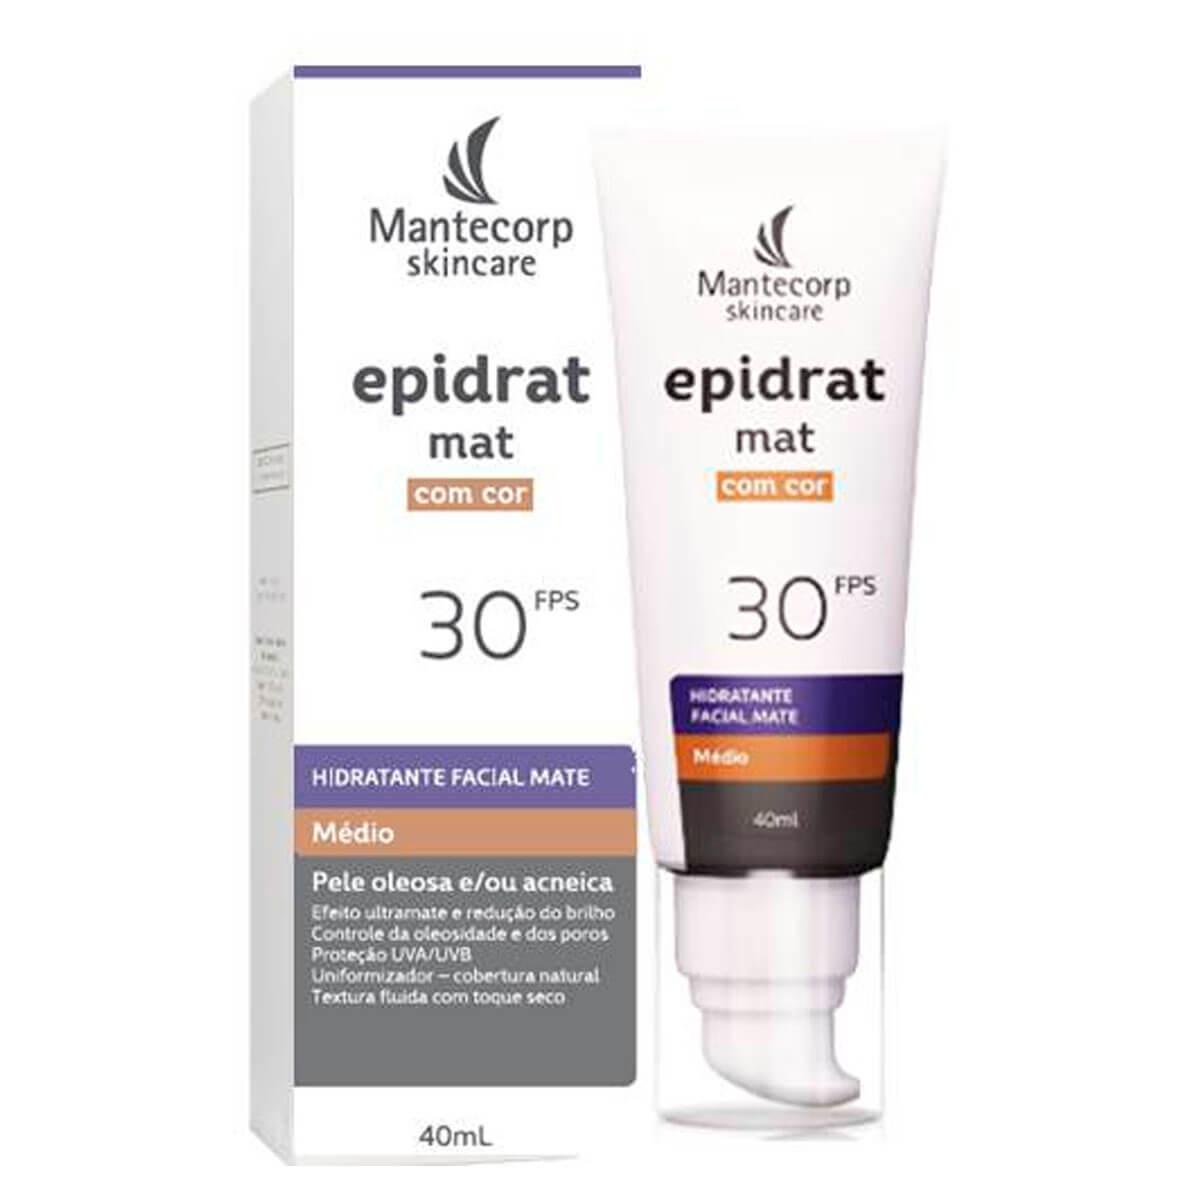 Hidratante Facial Mate Epidrat Mat com Cor Médio FPS30 40ml